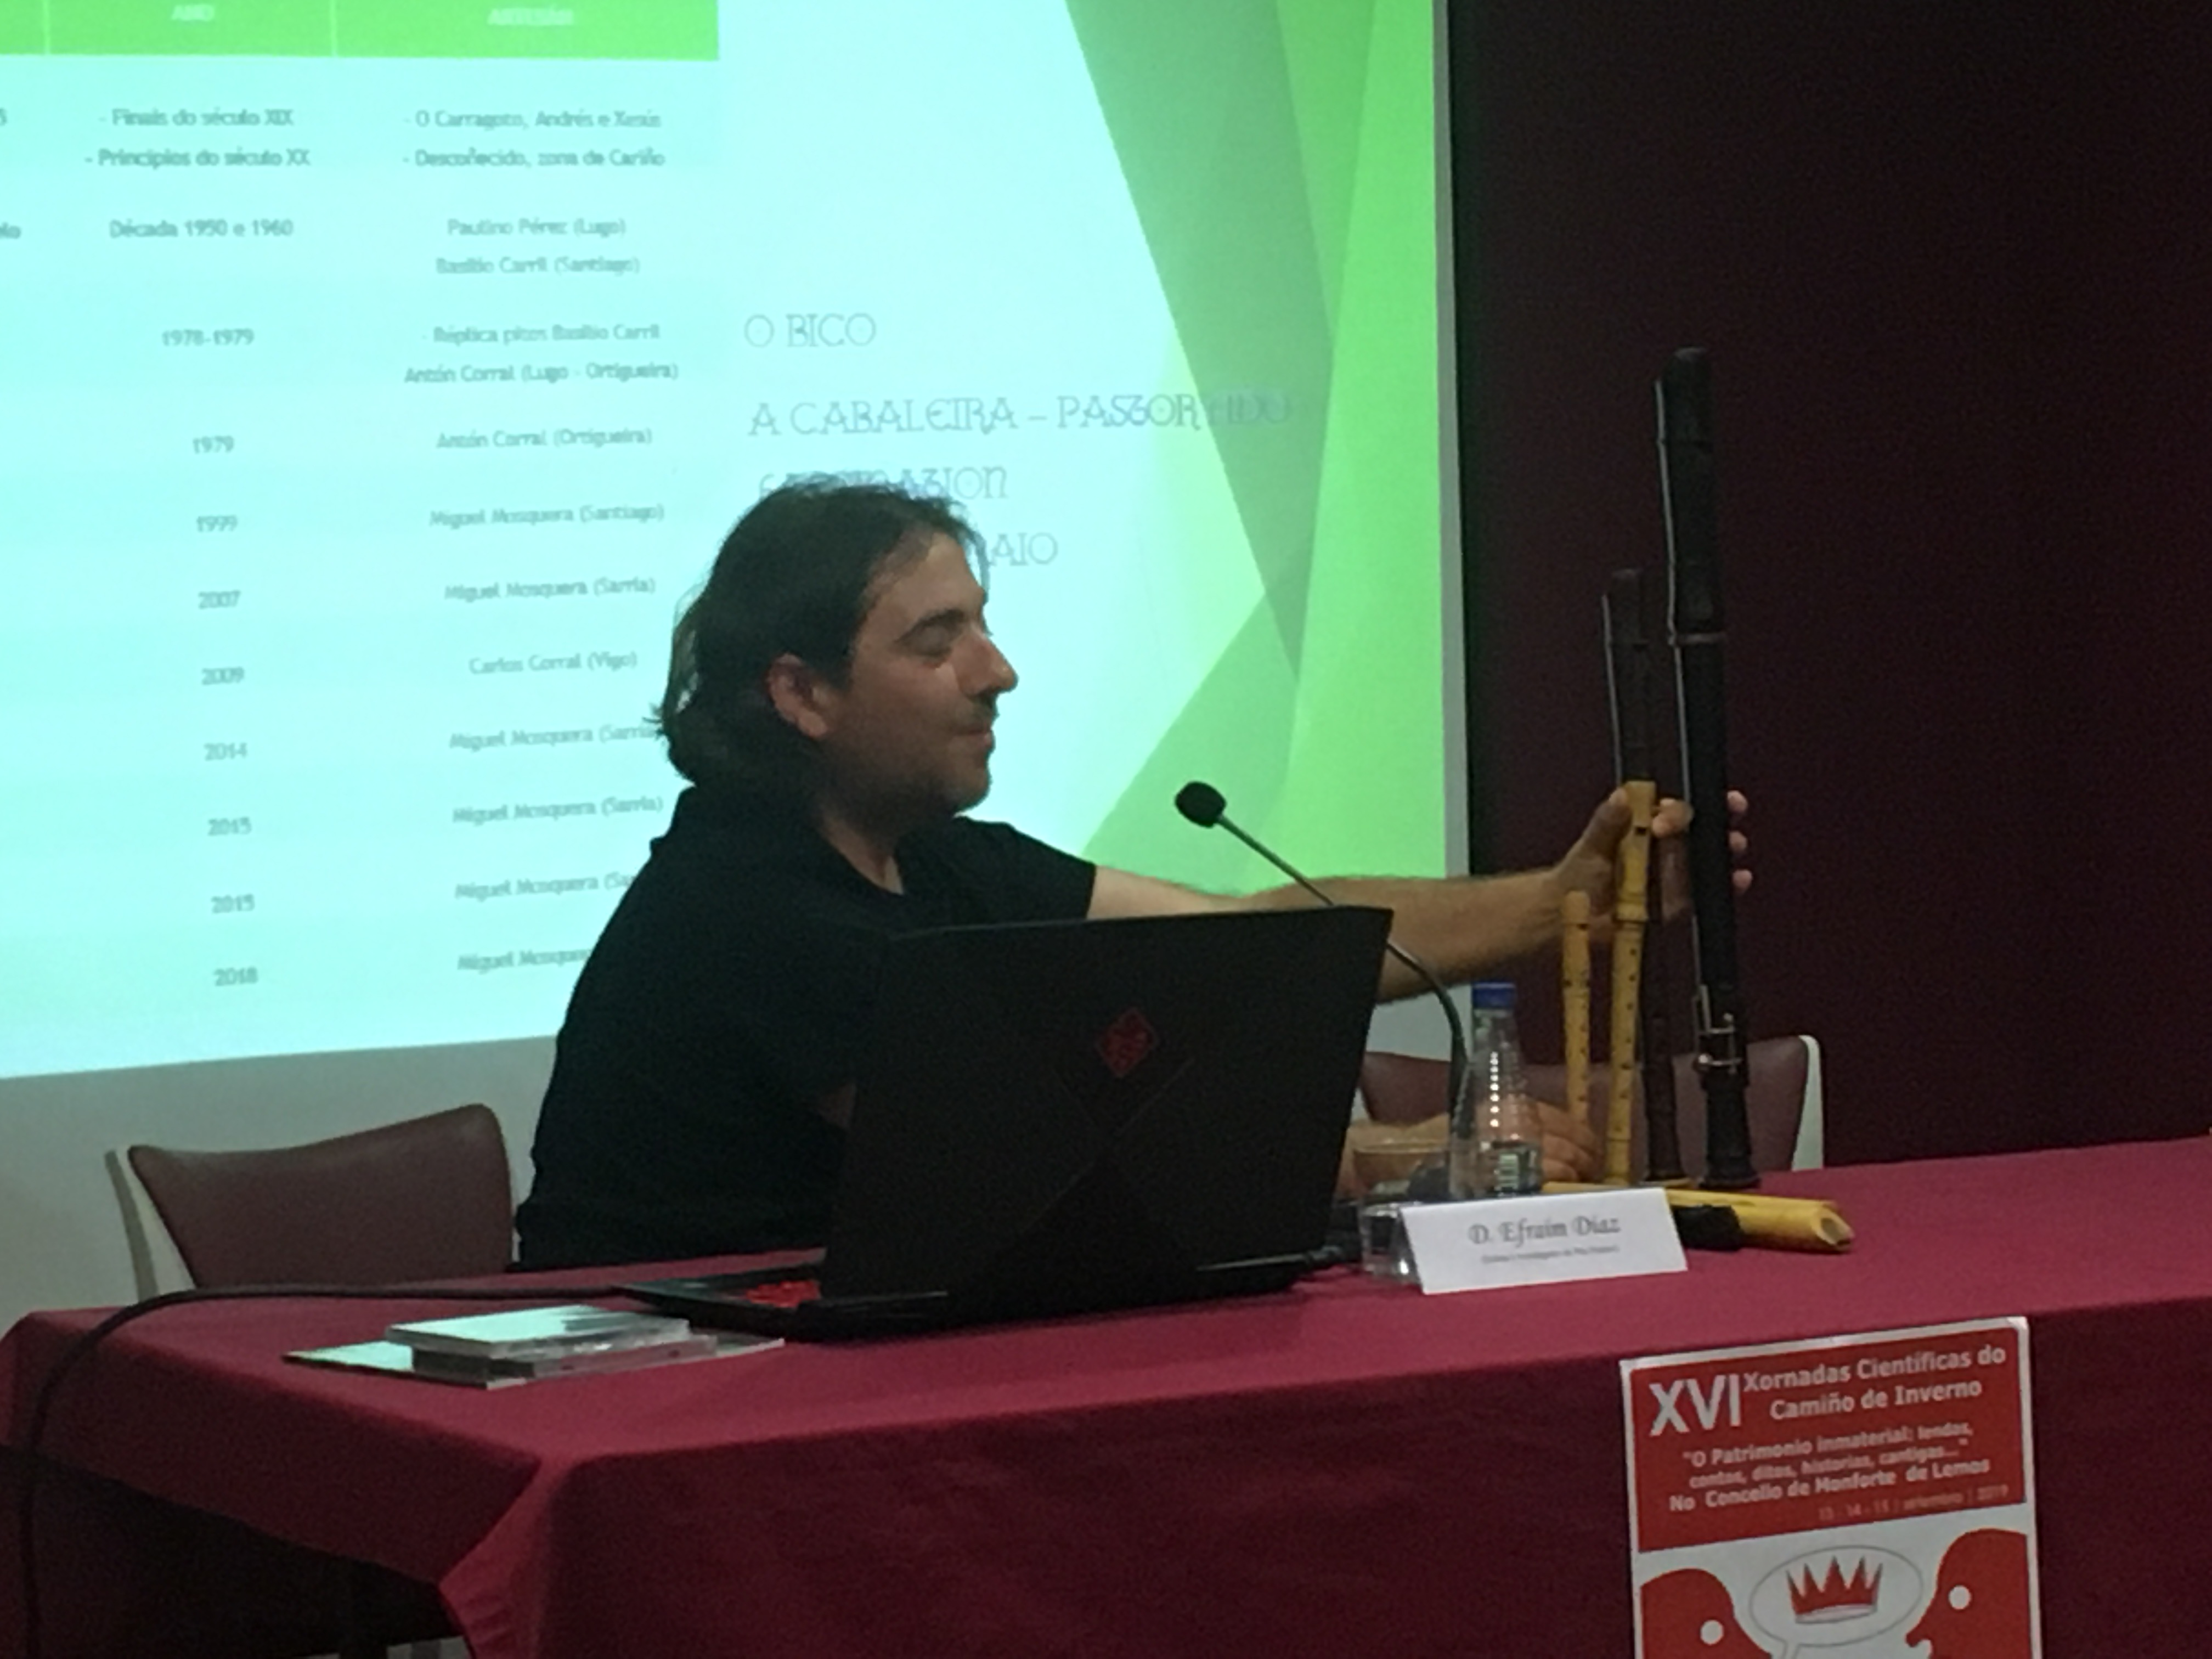 Segunda conferencia del músico e investigador Efraim Diaz